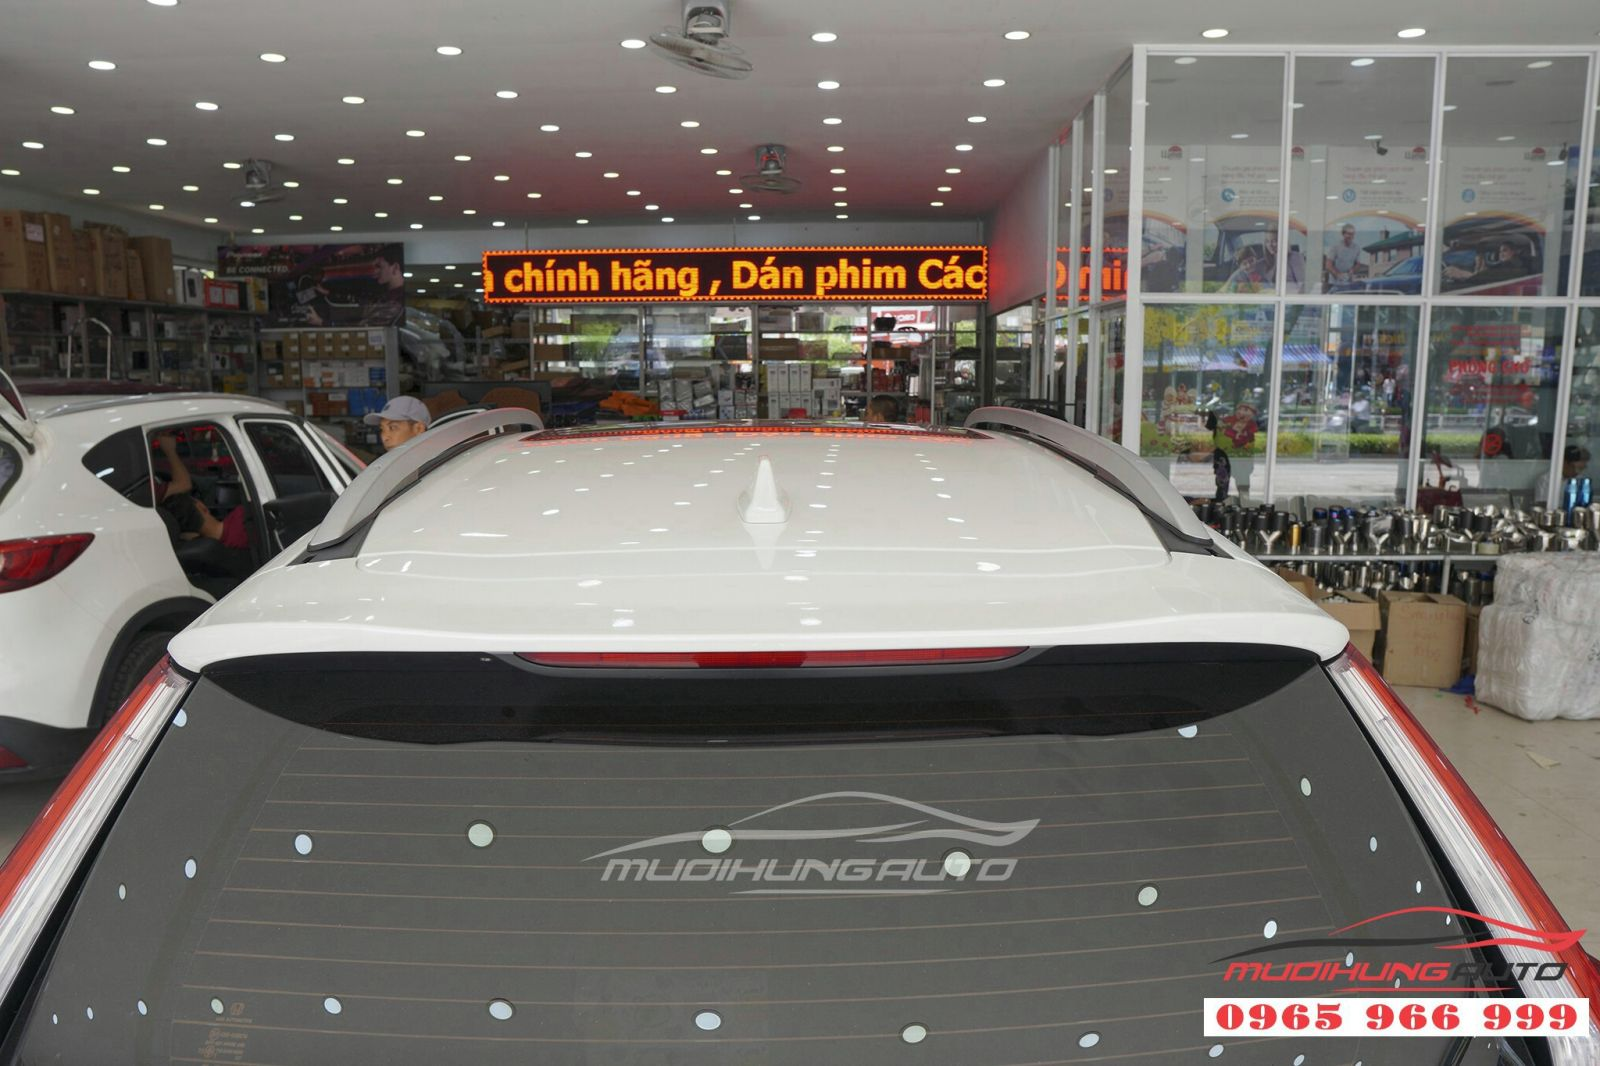 Lắp thanh giá nóc cao cho Honda CRV 2019 giá rẻ 06